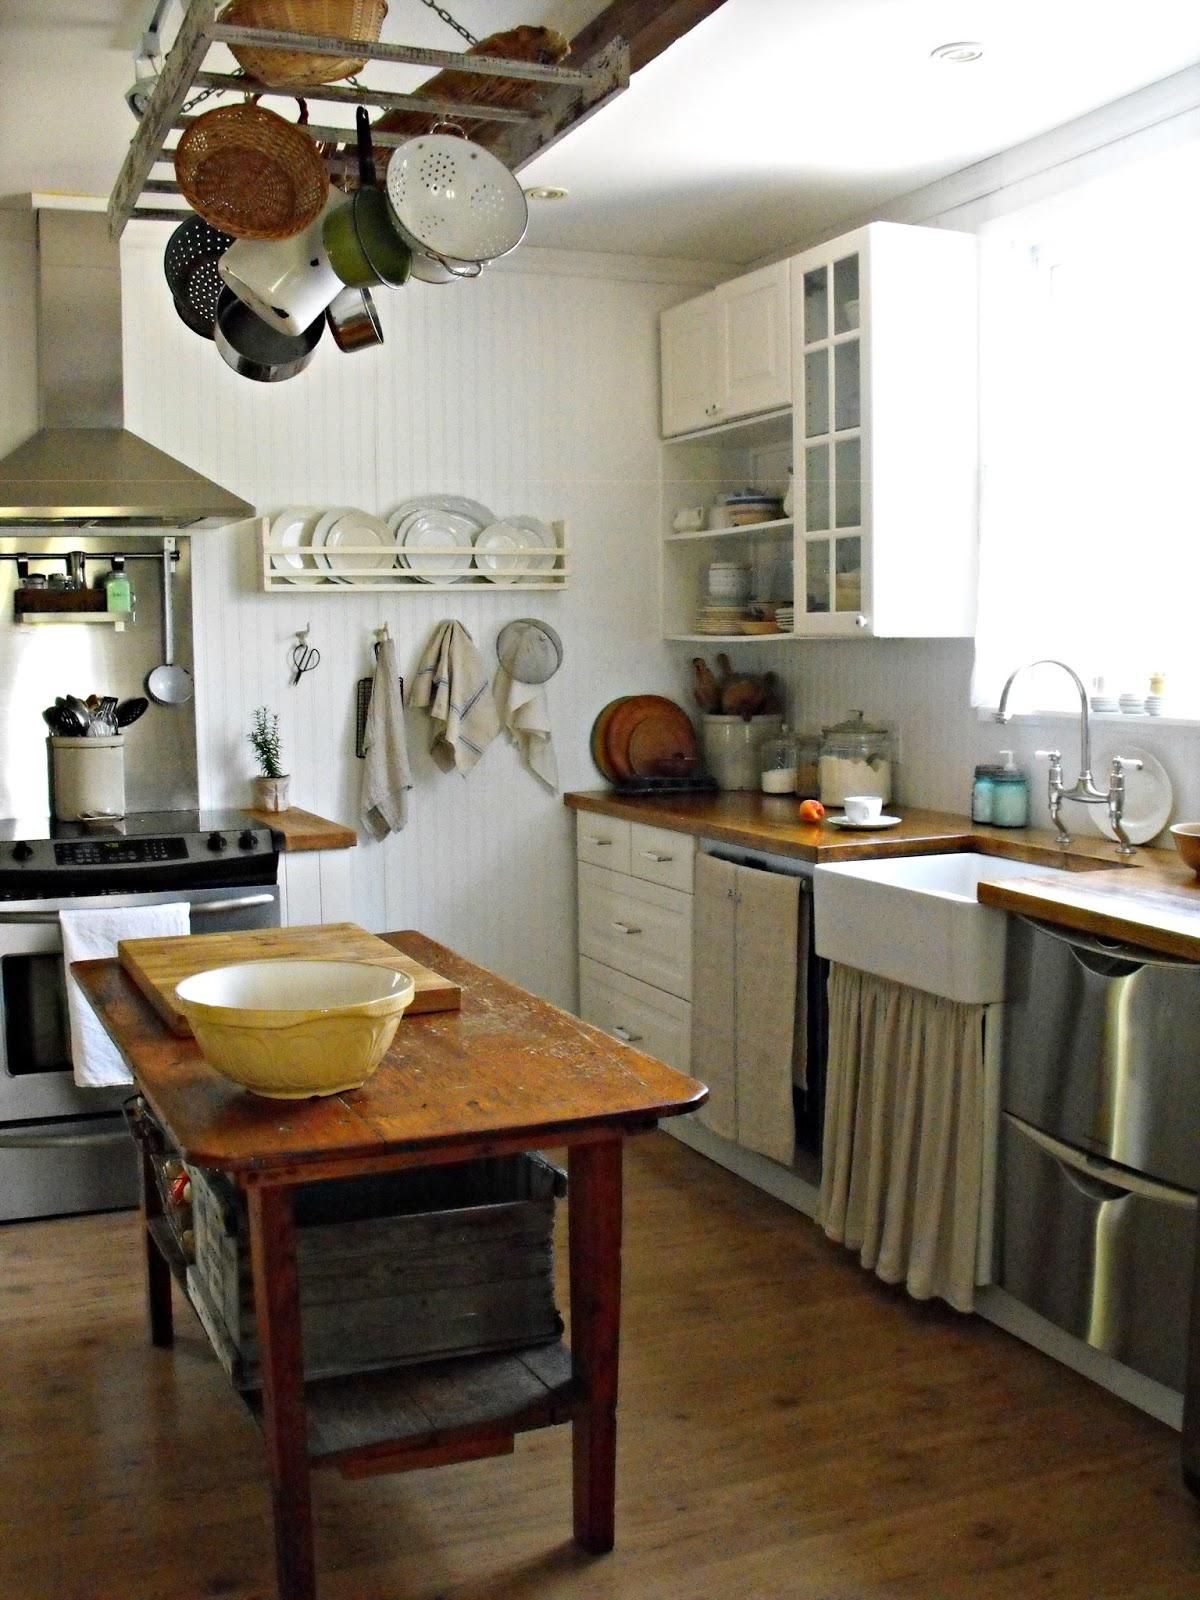 Rustic Farmhouse on Farmhouse Rustic Kitchen  id=84591